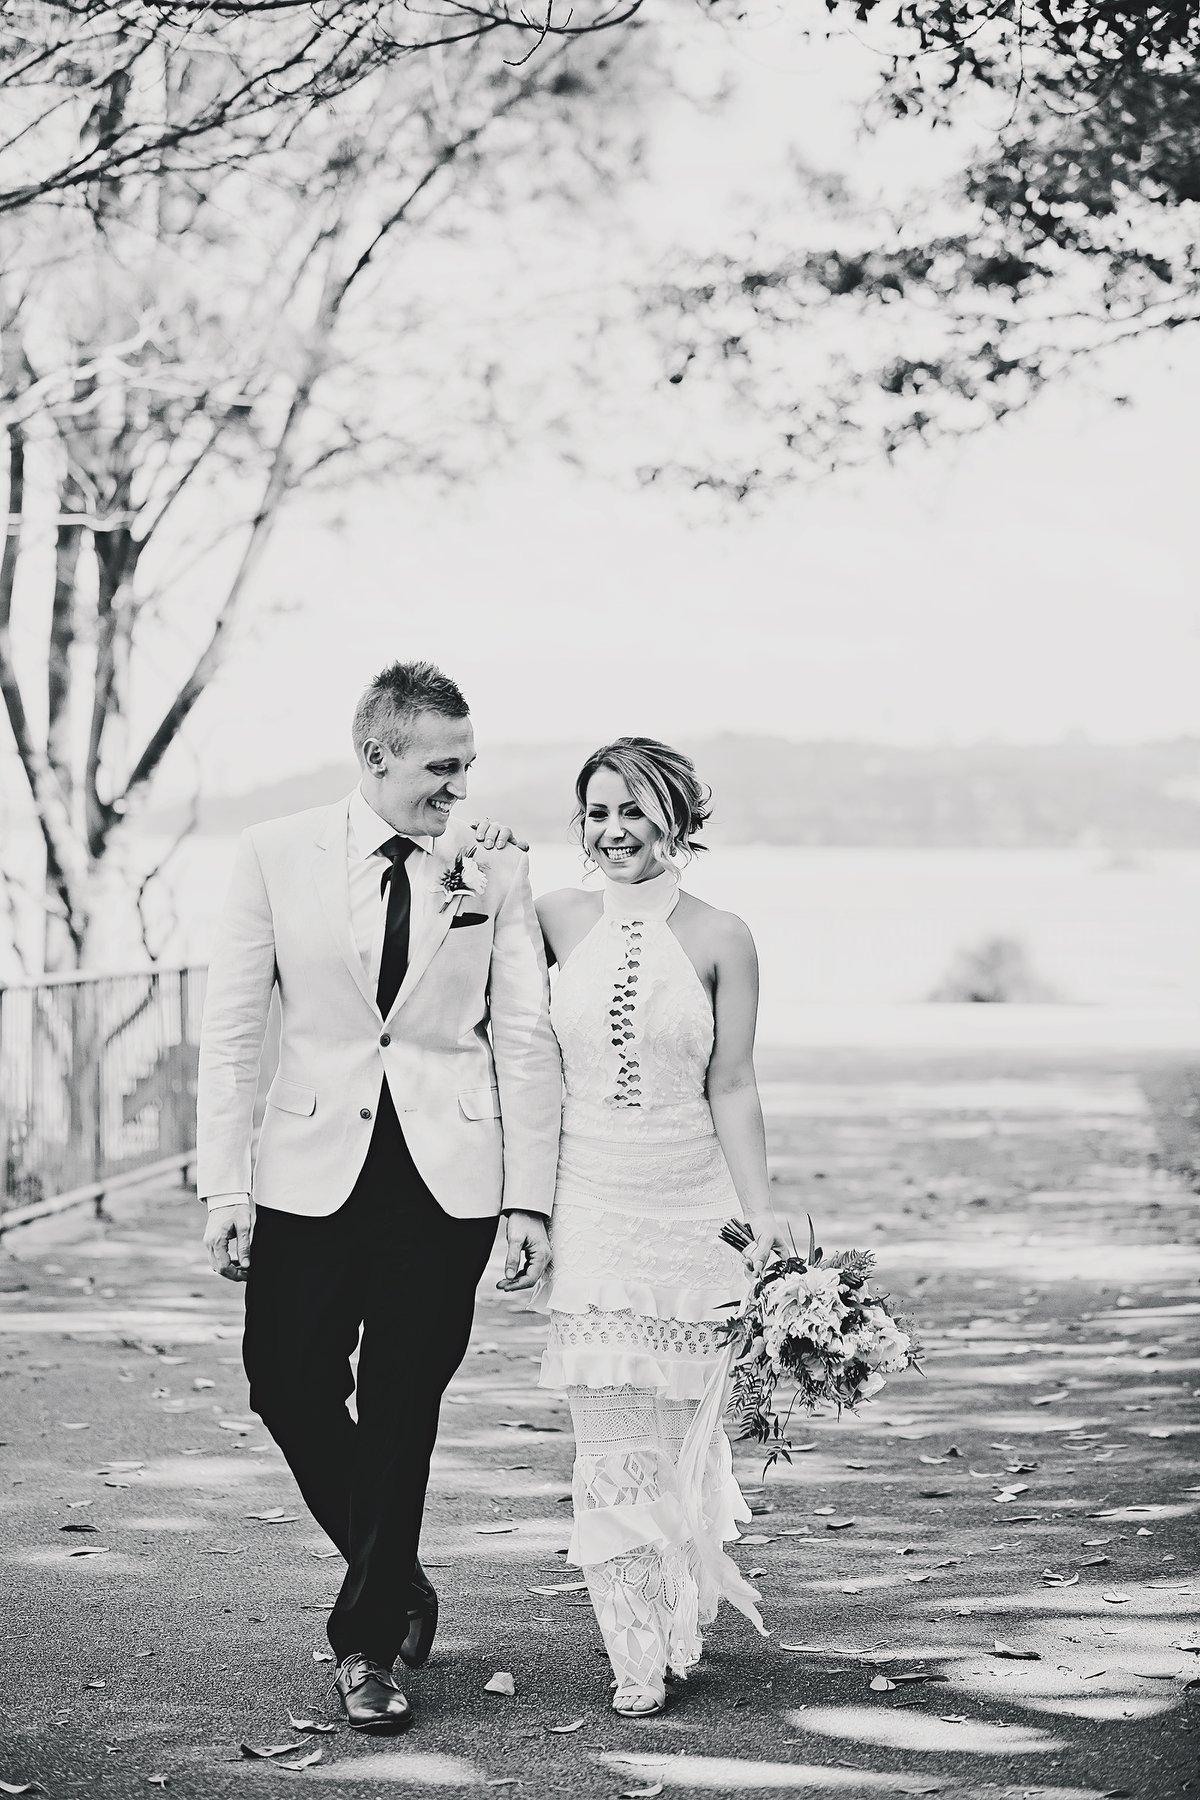 Bride Groom Wedding Day Manly Inspiration.jpg